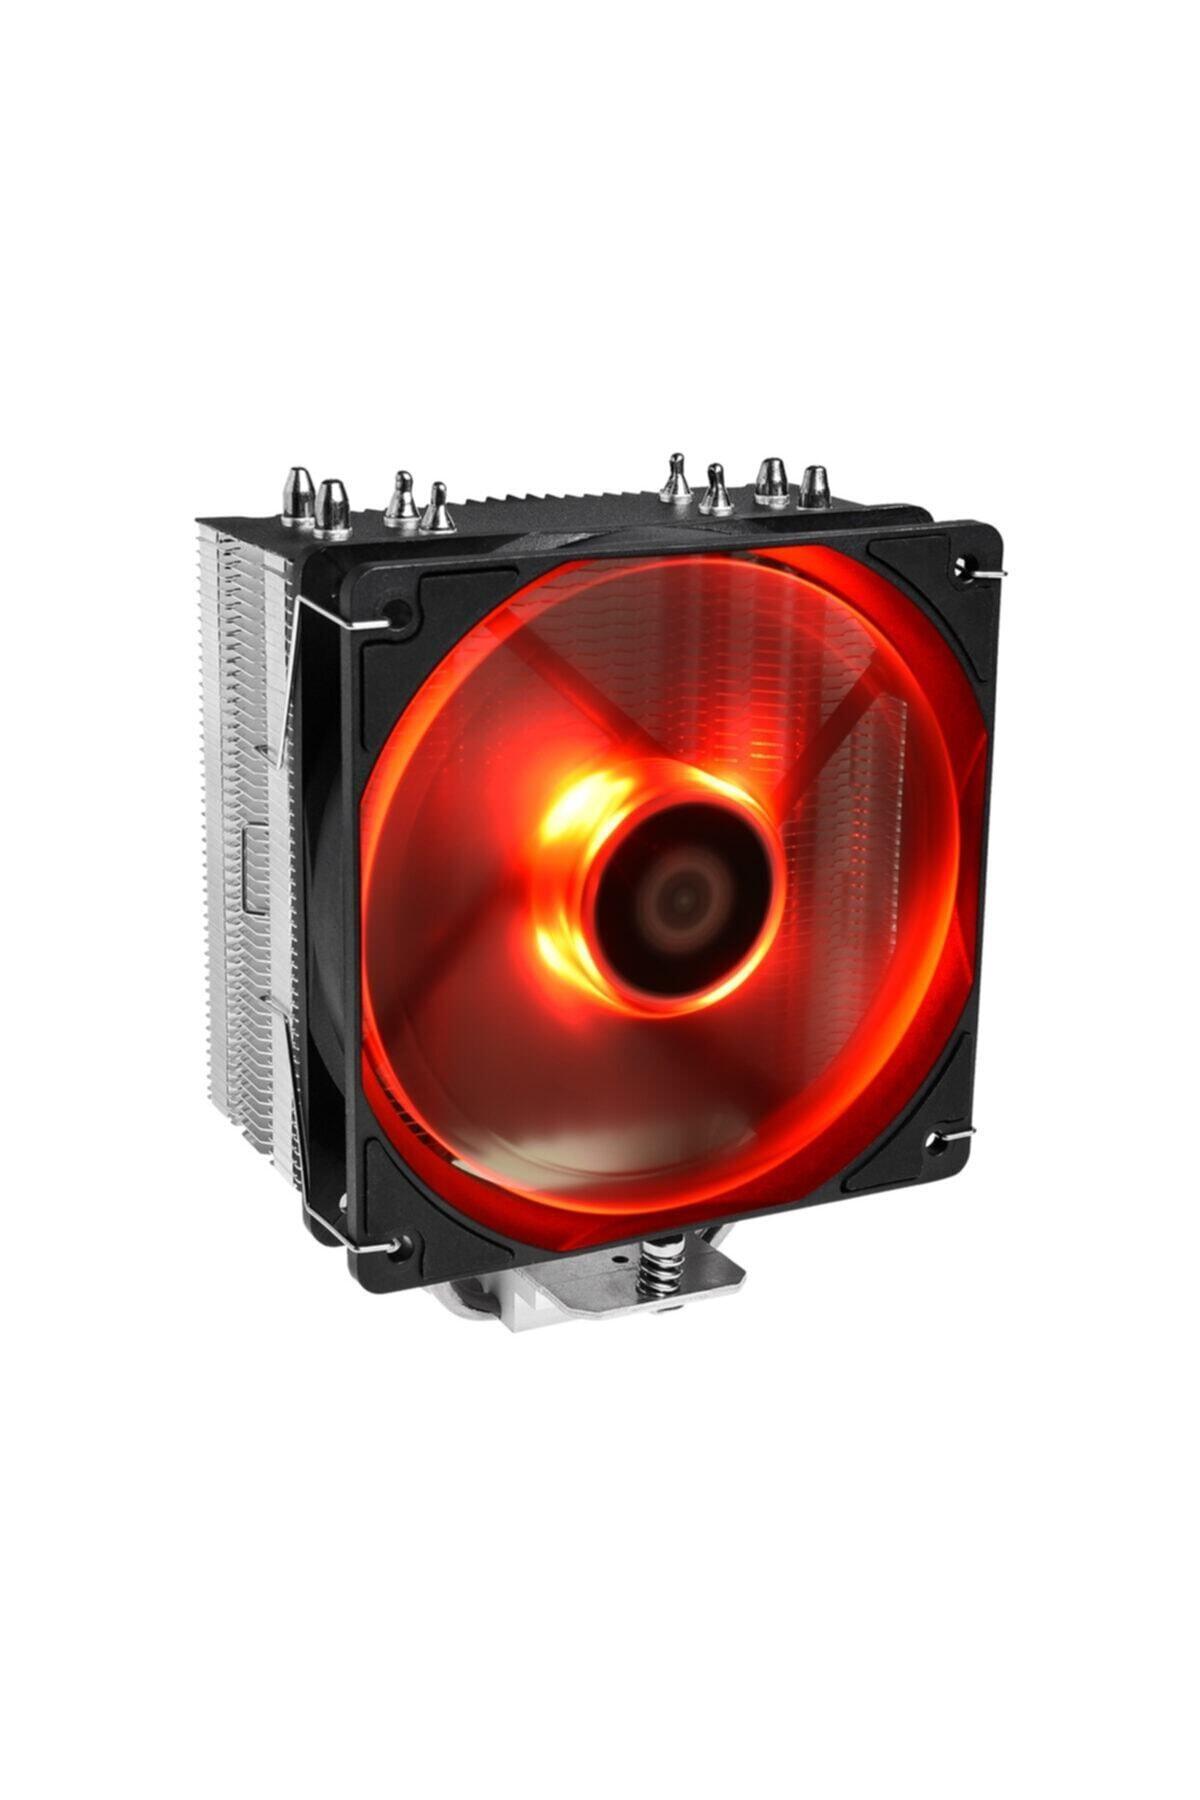 ID-COOLİNG Id-coolıng Se-224-xt Red 120mm 4pin Pwm Kırmızı Ledli Işlemci Soğutucu